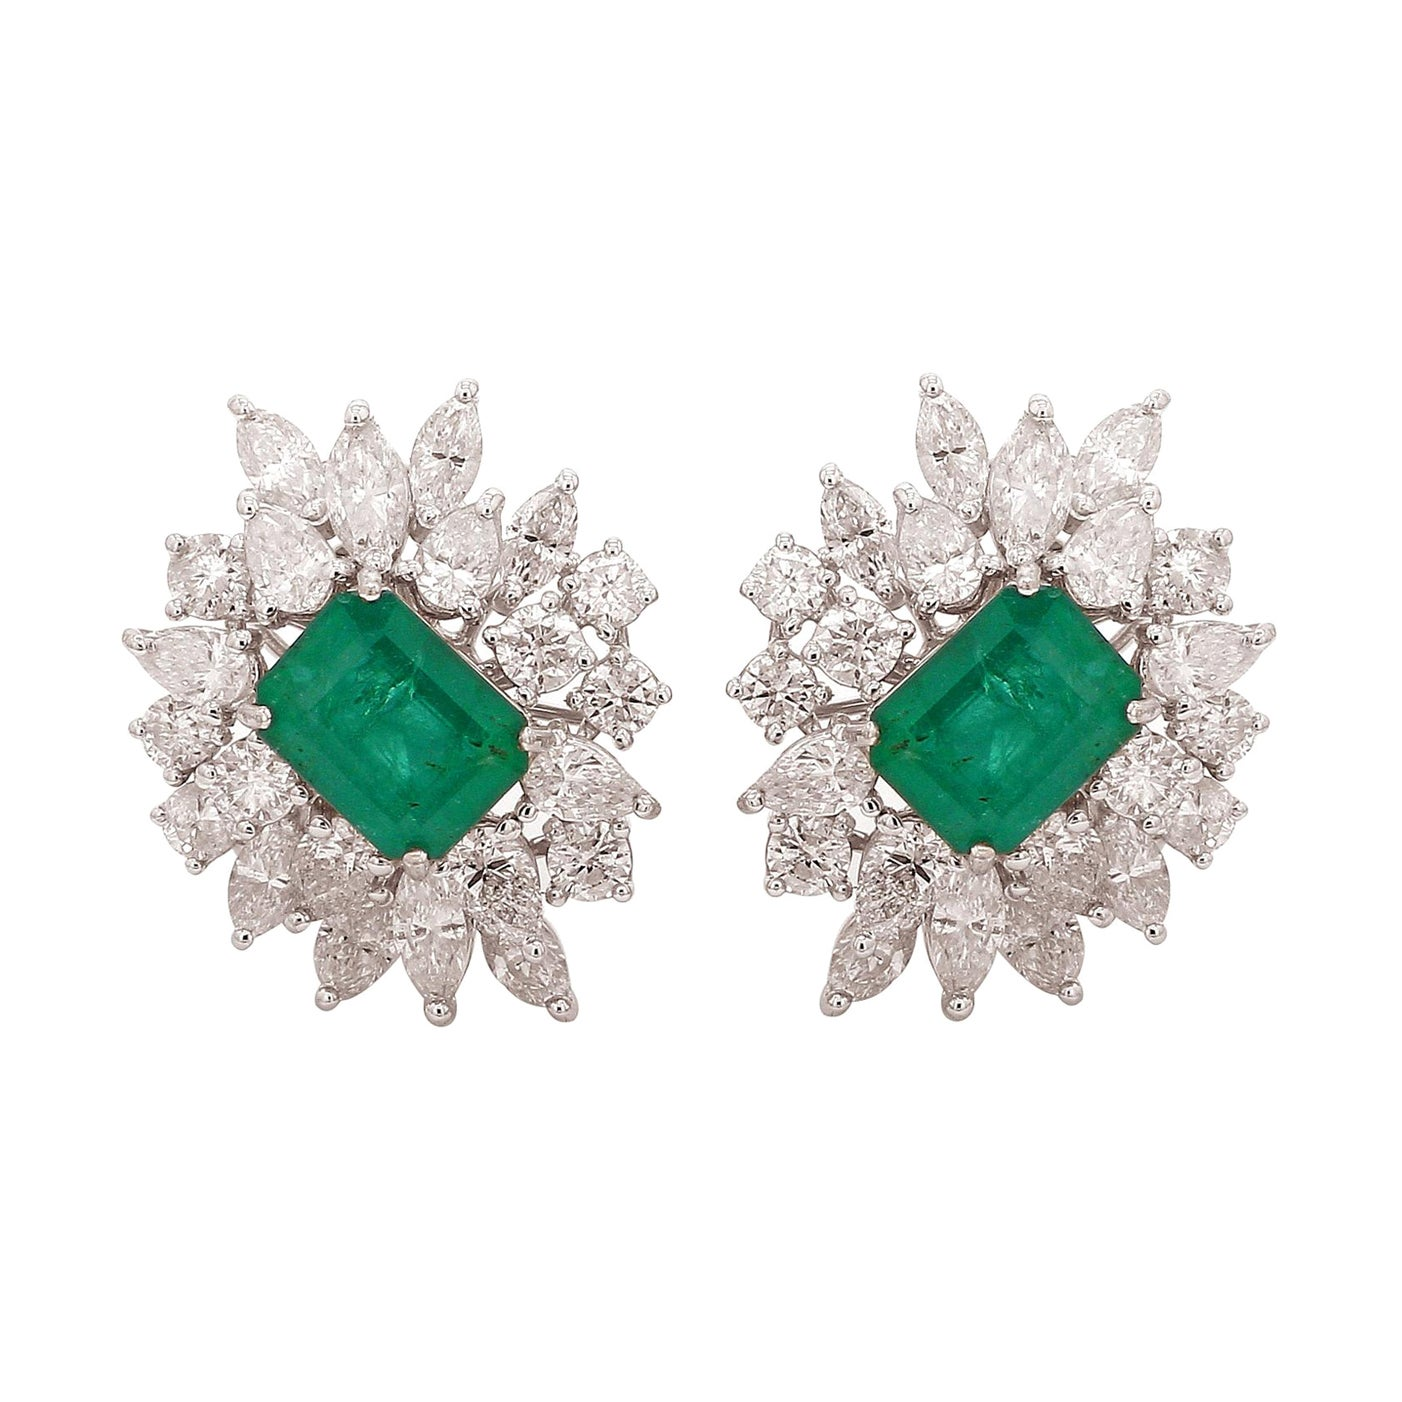 5.90 Carat Diamond Emerald 18 Karat Gold Cluster Stud Earrings